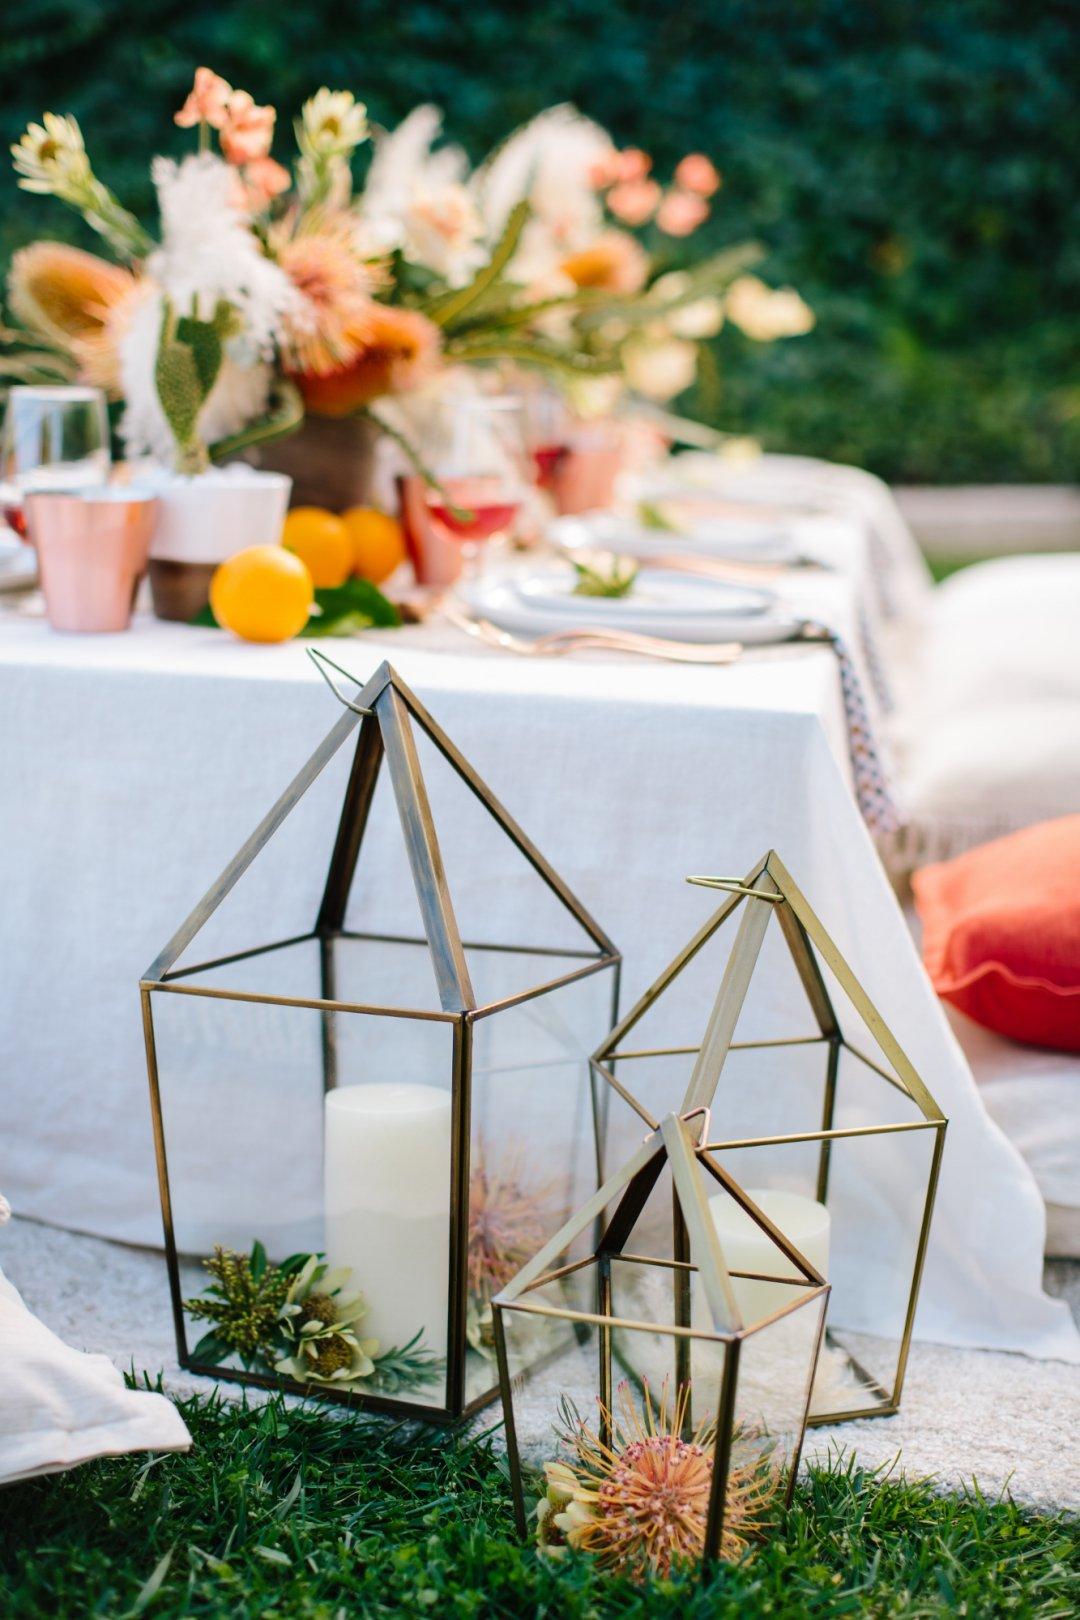 Brass lanterns in three sizes next to dinner table